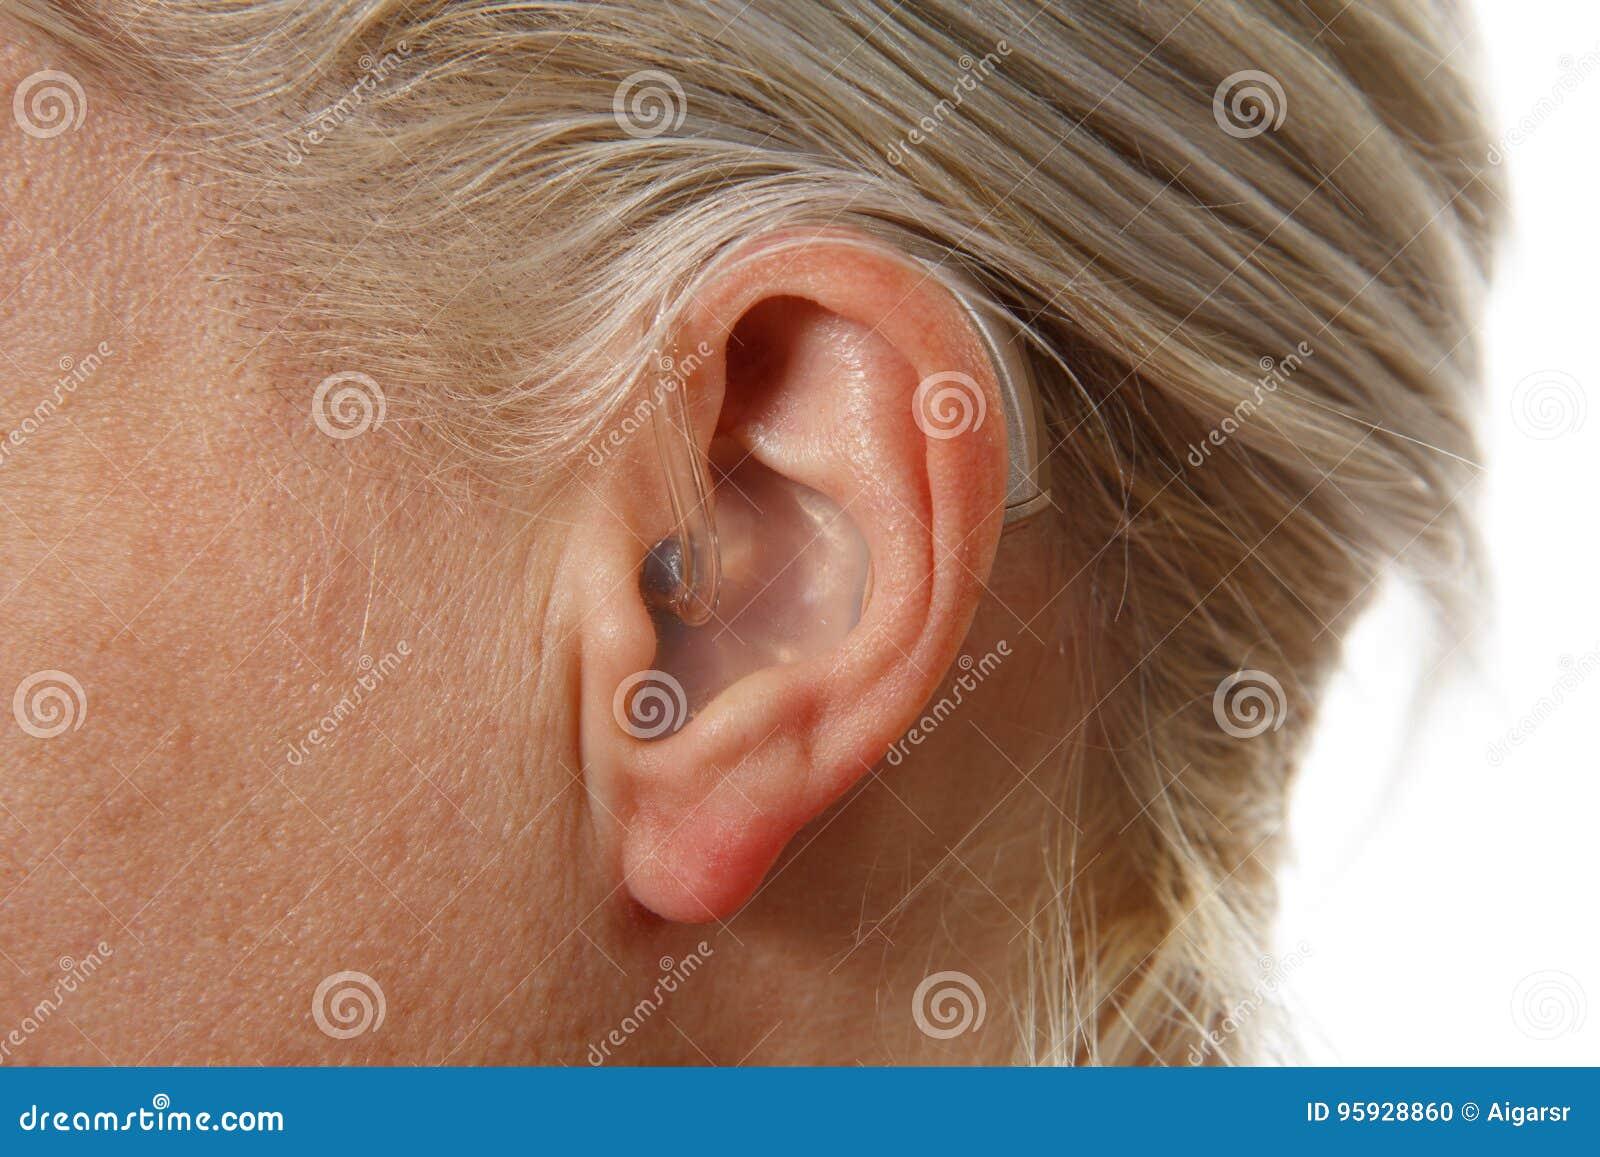 Digital-Hörgerät in Frau ` s Ohr